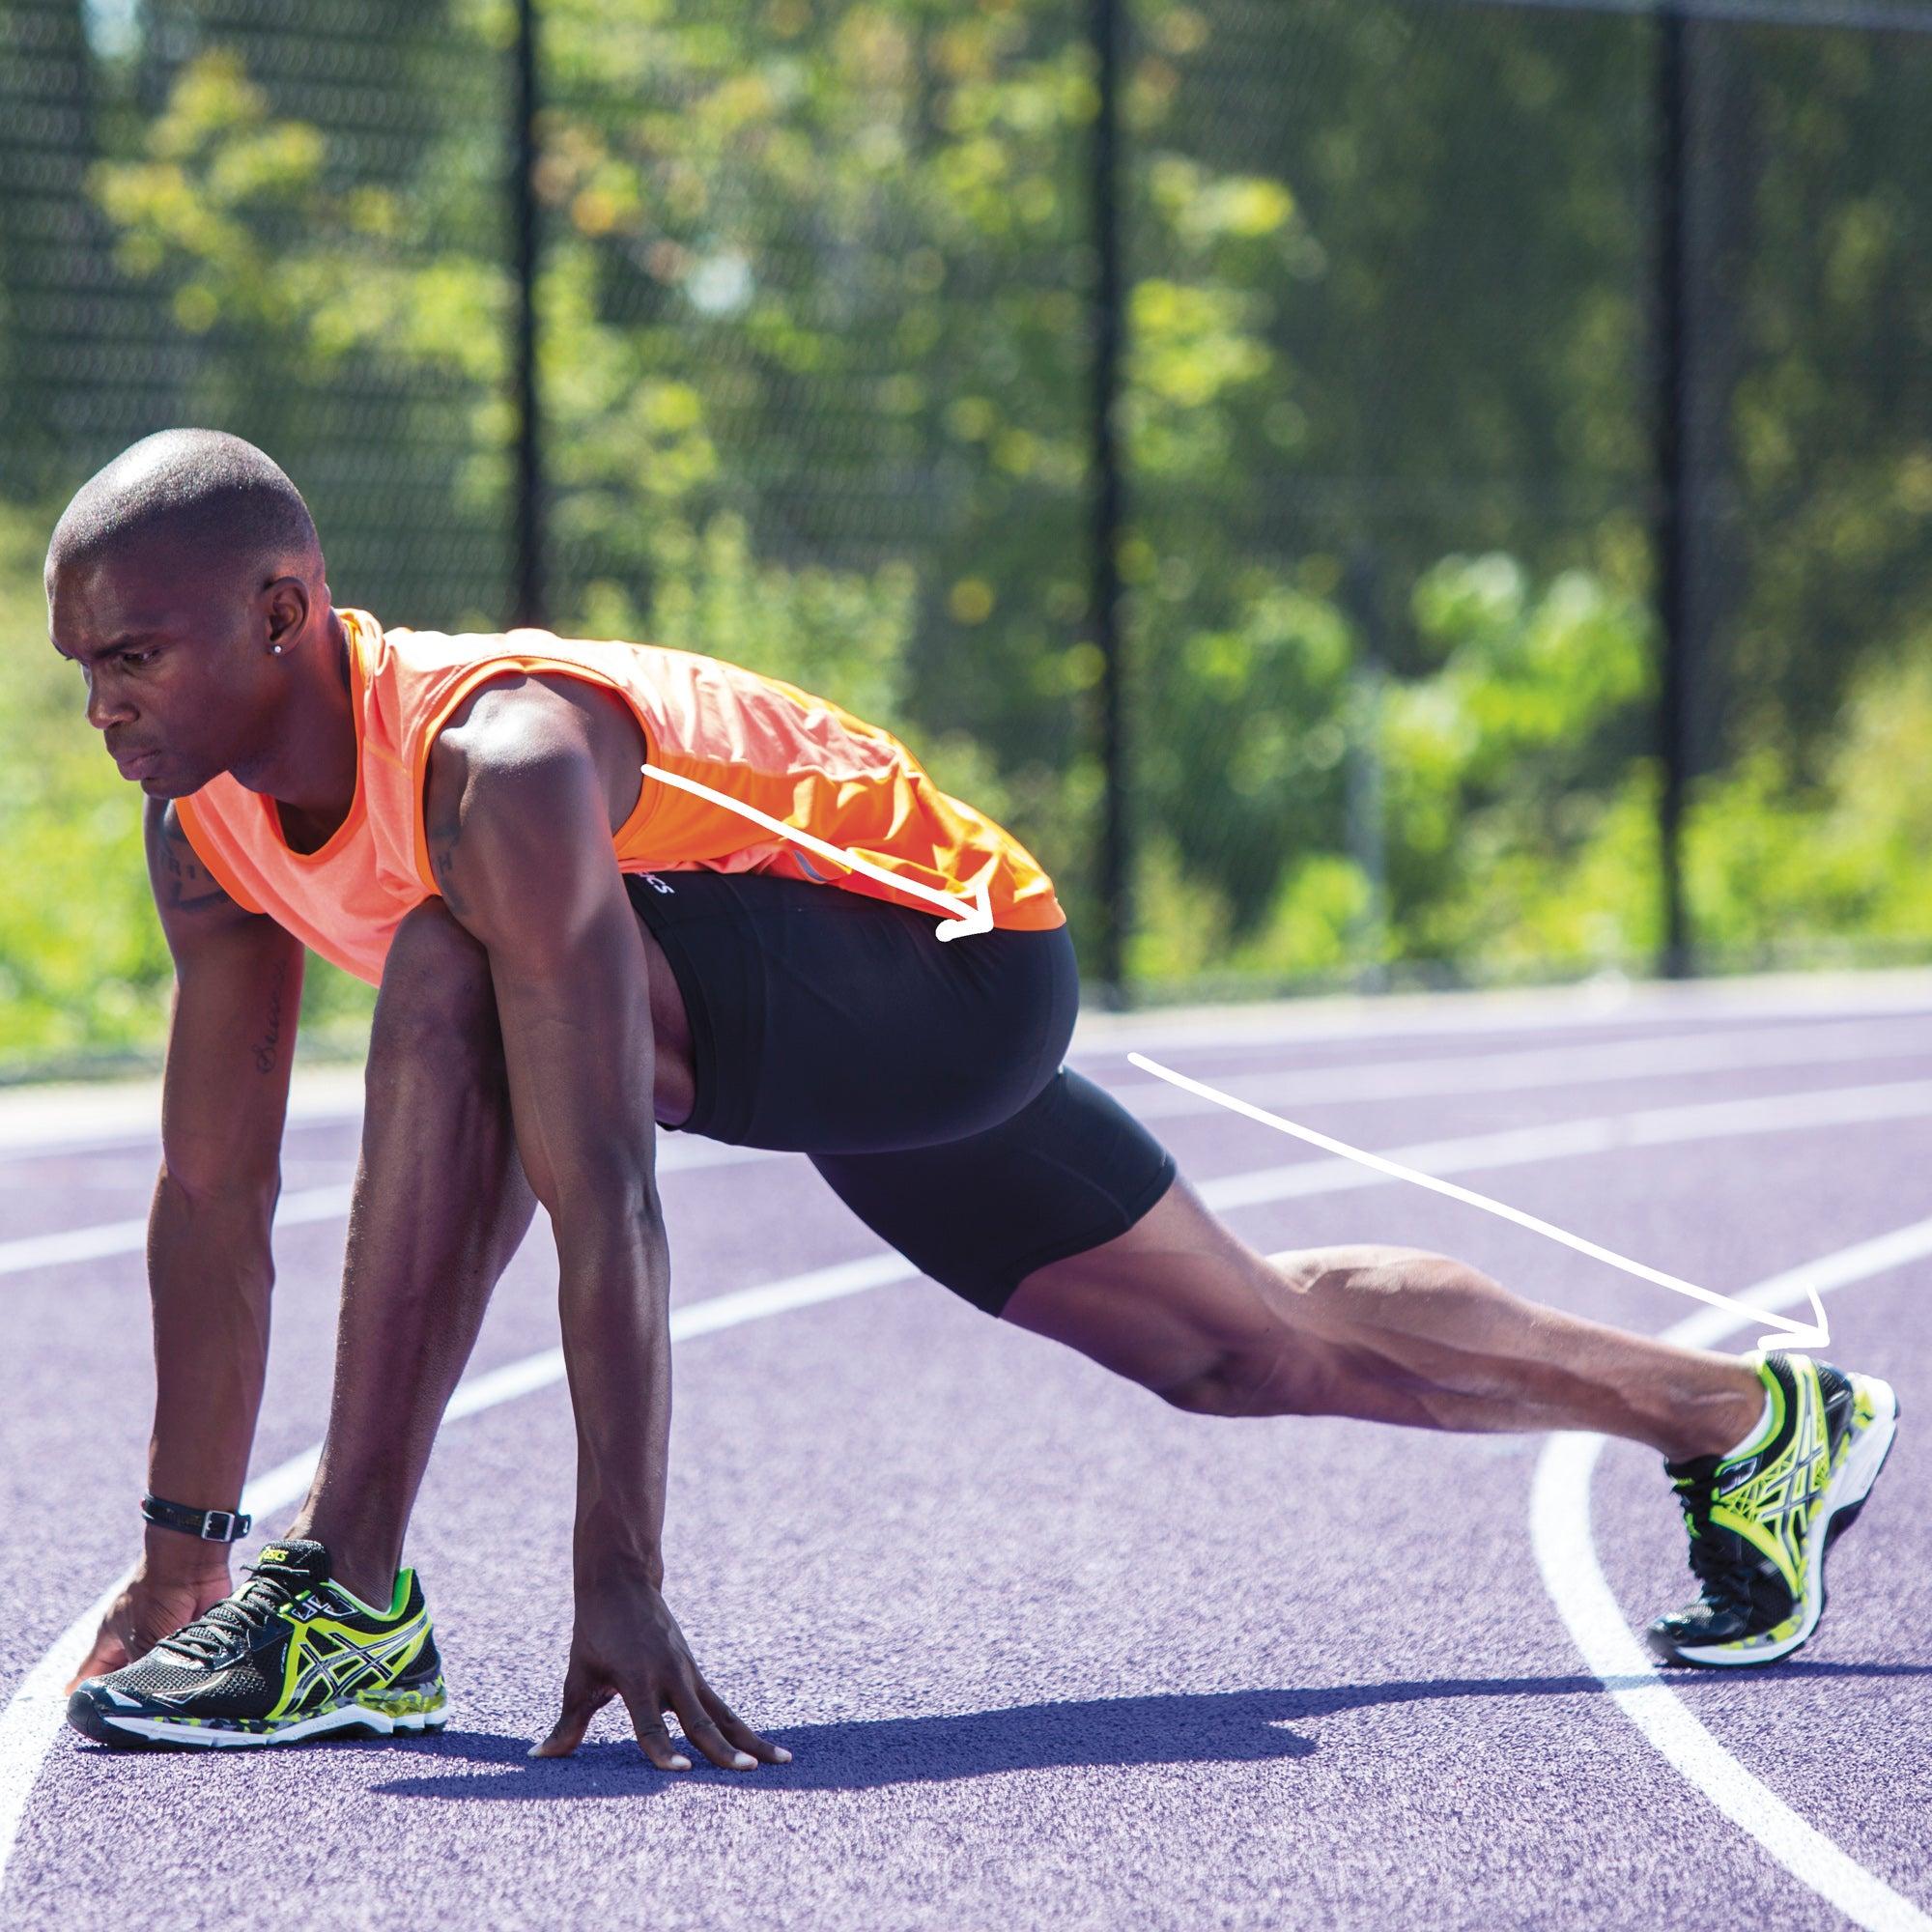 Man in a runner's lunge